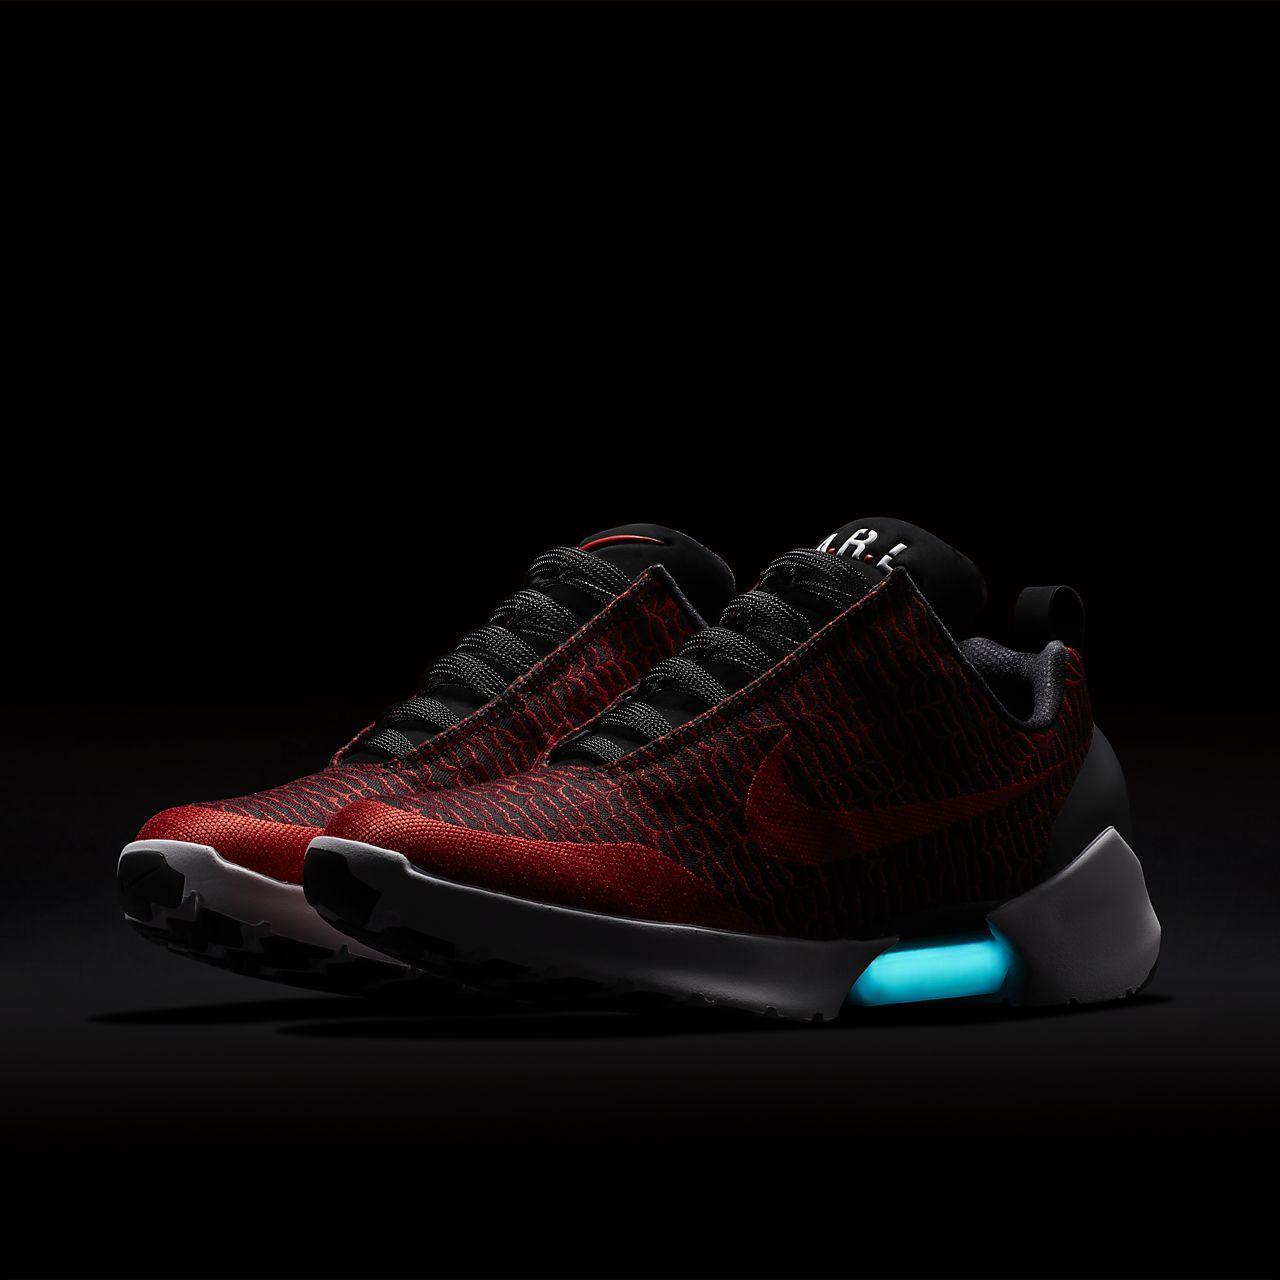 0 1 Pour Nike Hyperadapt Hommeprise Gb Chaussure rBxeCWdo